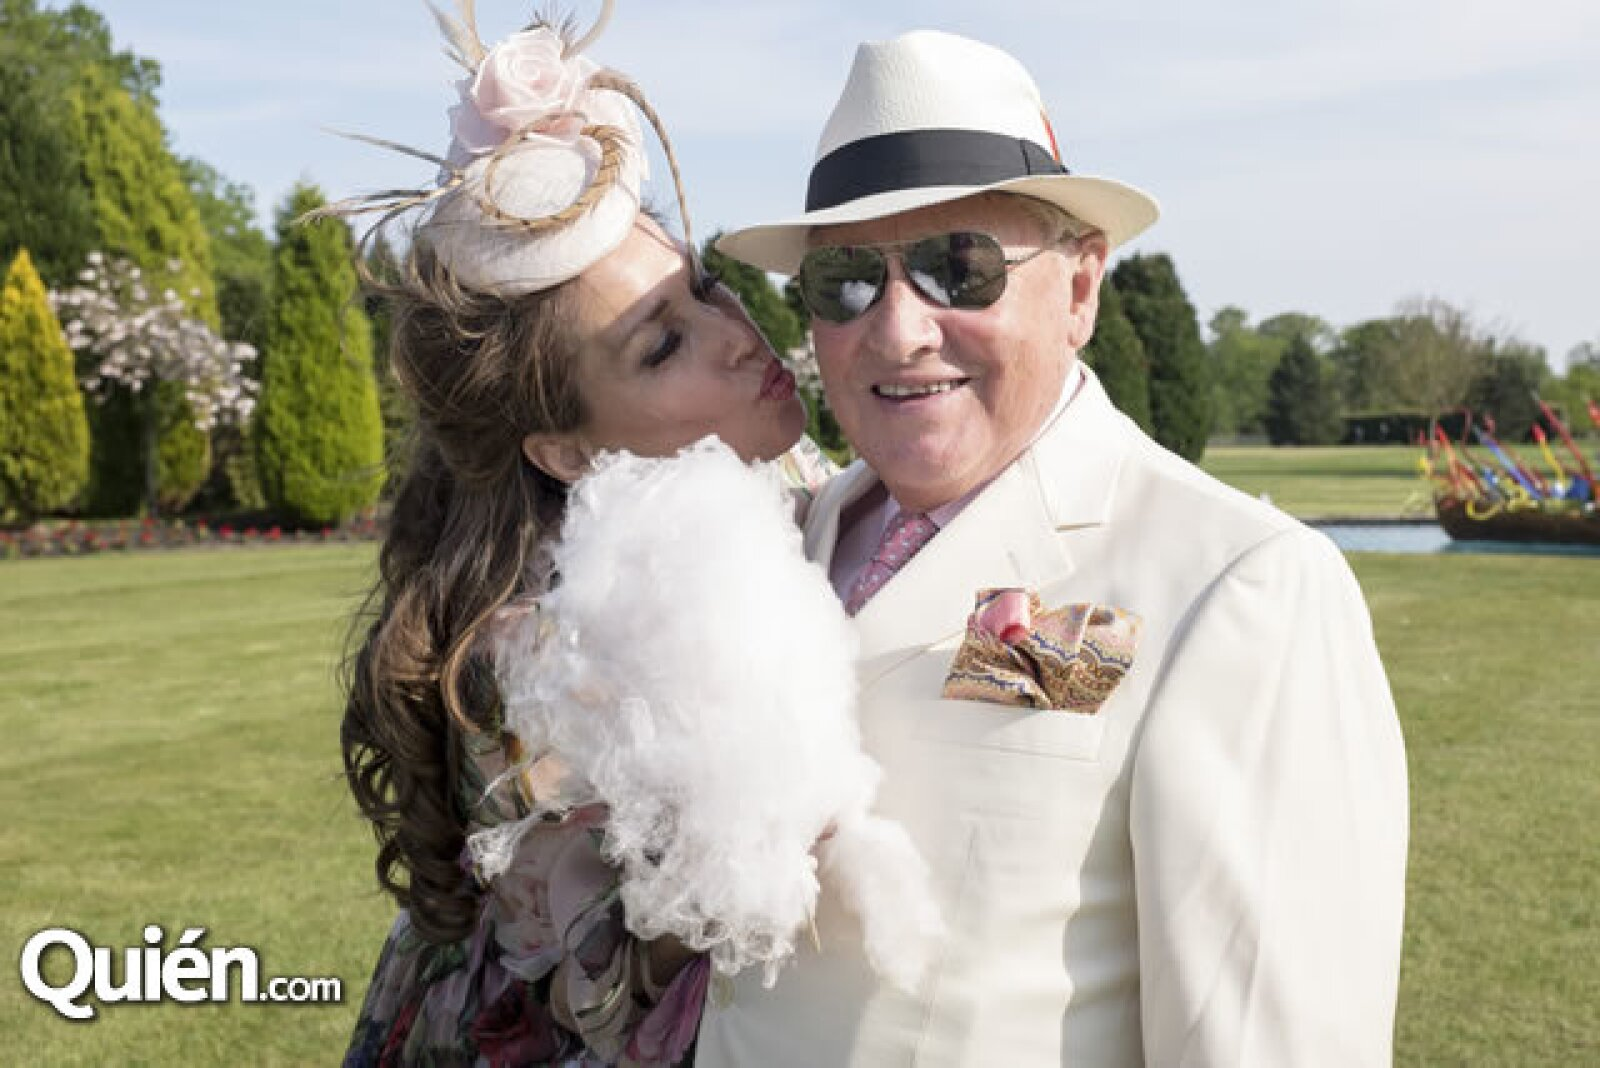 Sonia Falcone y George Shaked